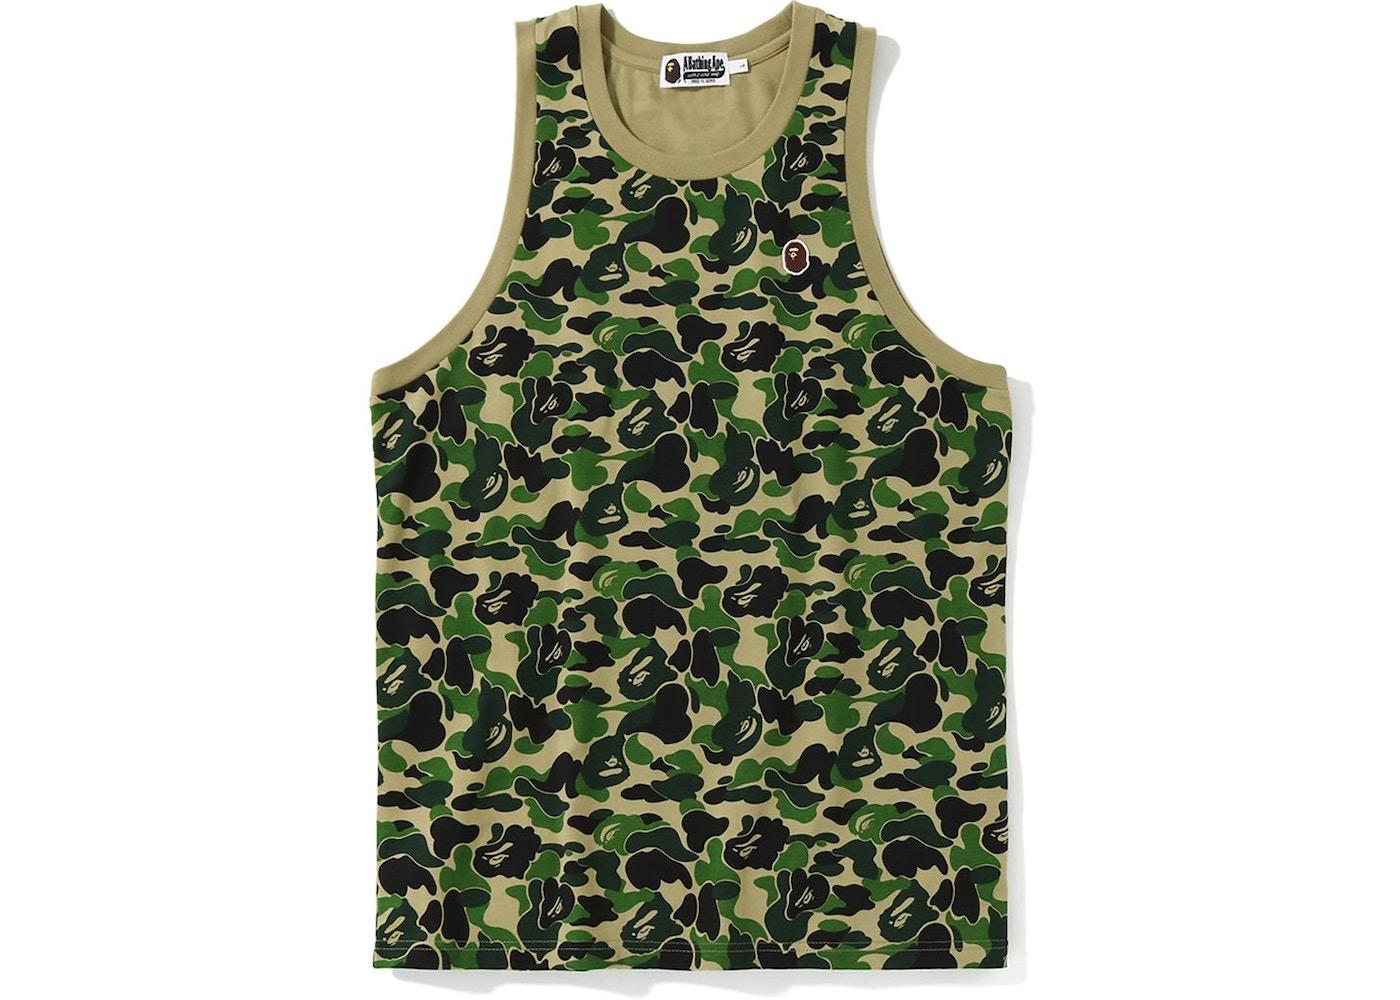 on sale bdacb bcf0e Buy   Sell Bape Streetwear